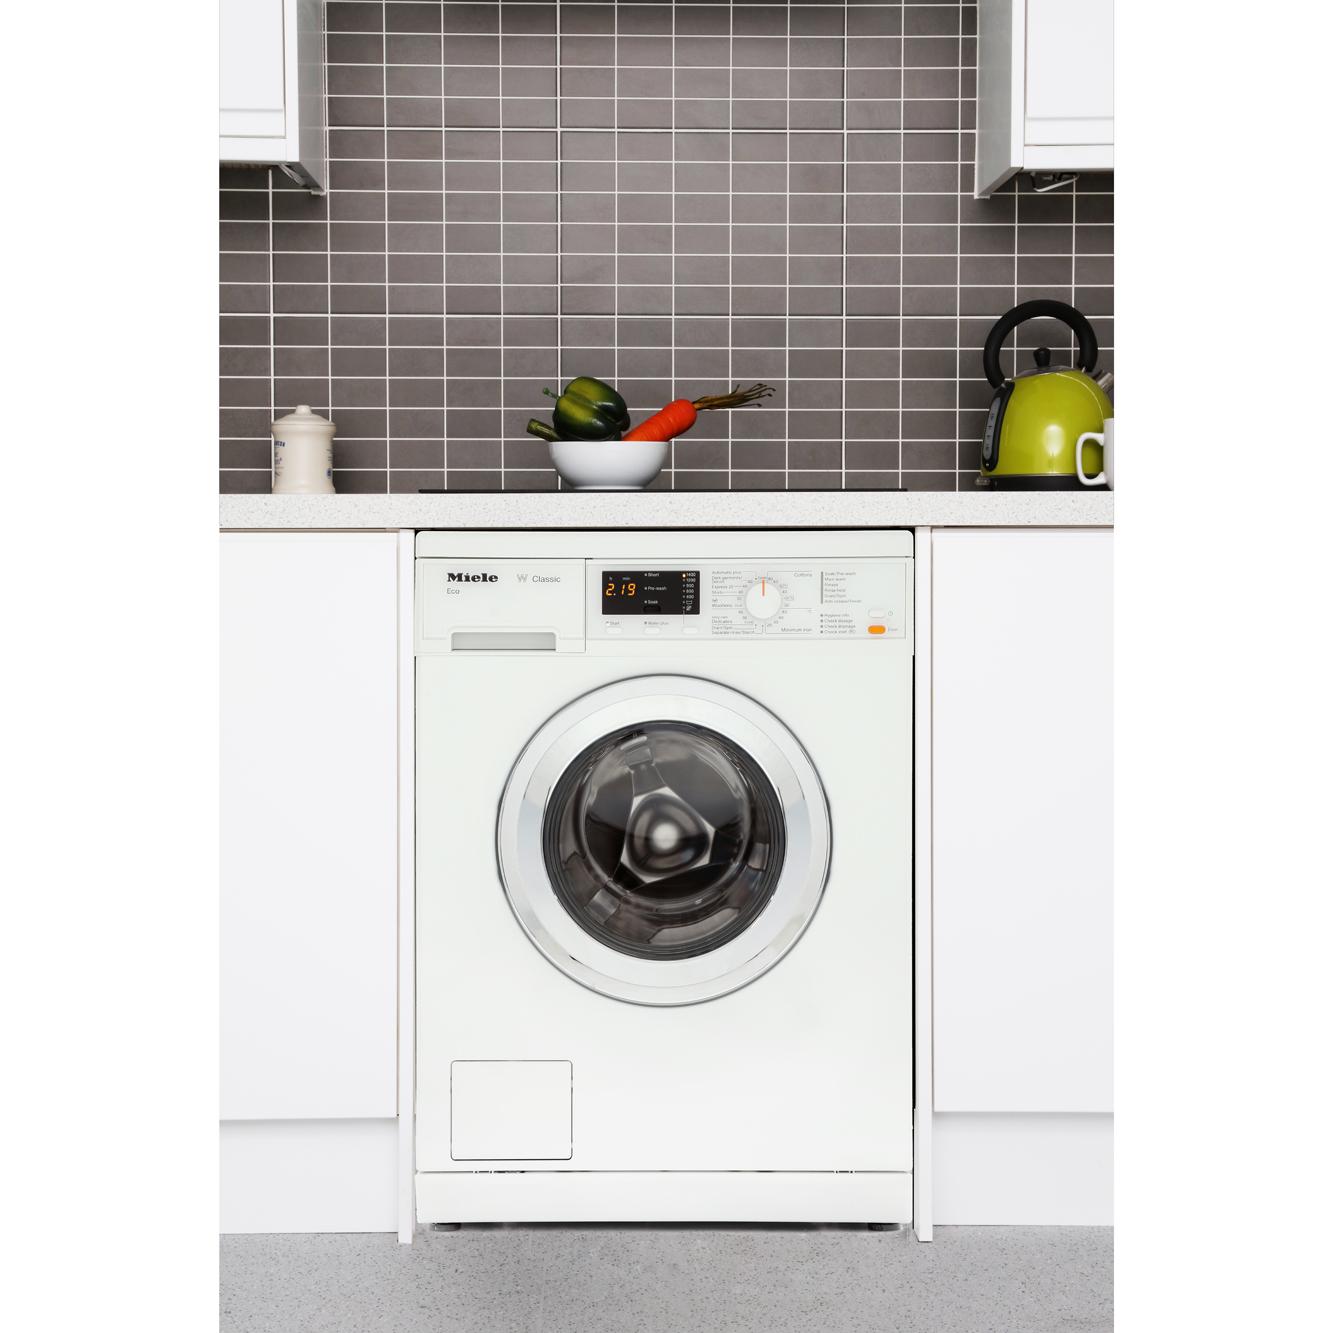 Buy Miele WDA101 Washing Machine - Lotus White with Chrome ...